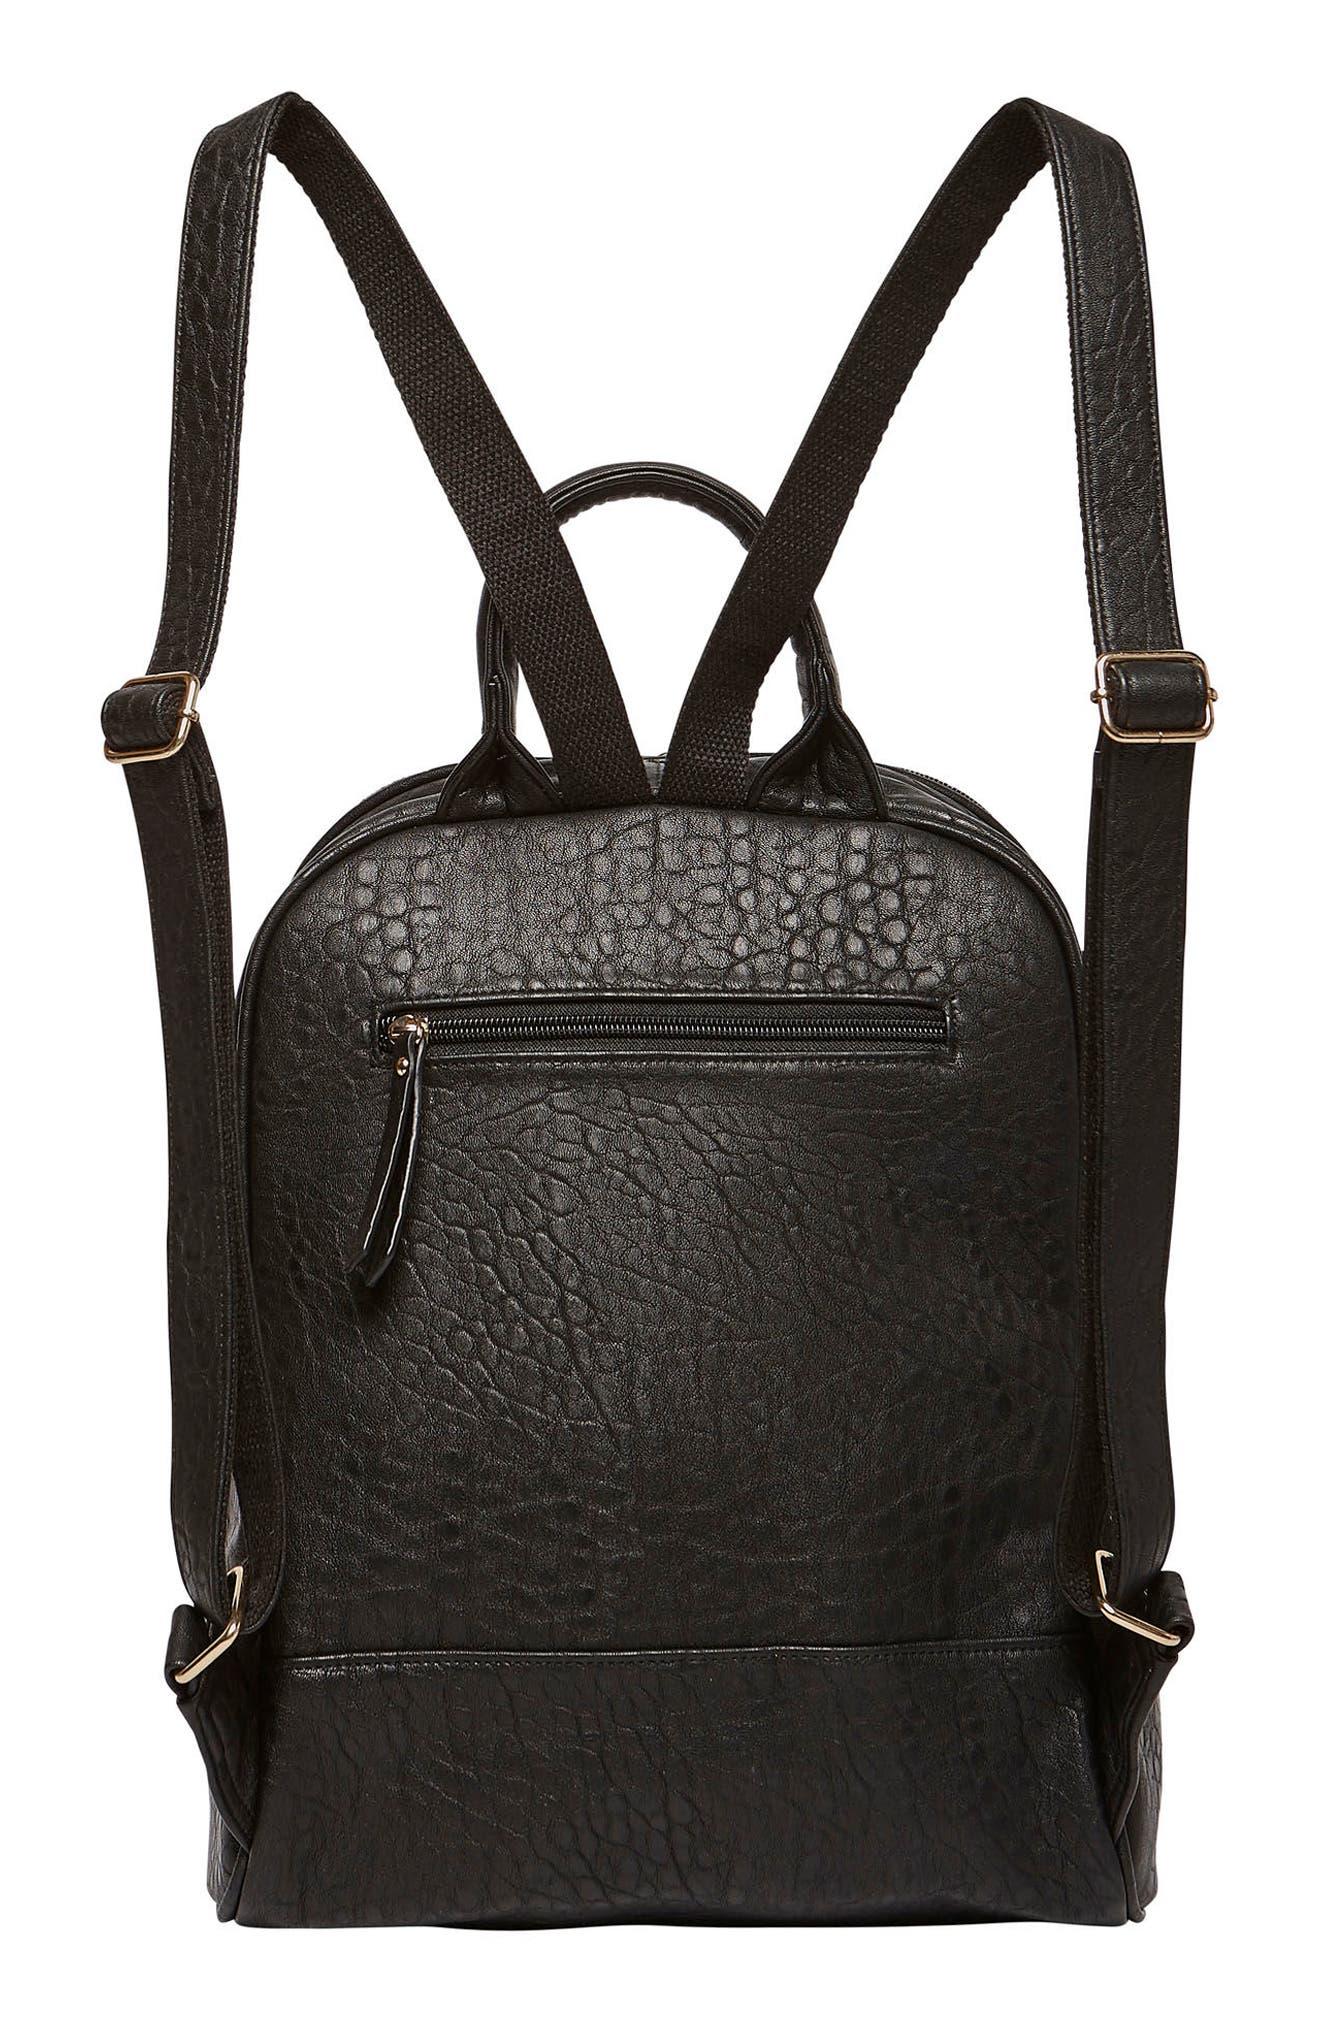 My Way Vegan Leather Backpack,                             Alternate thumbnail 2, color,                             BLACK